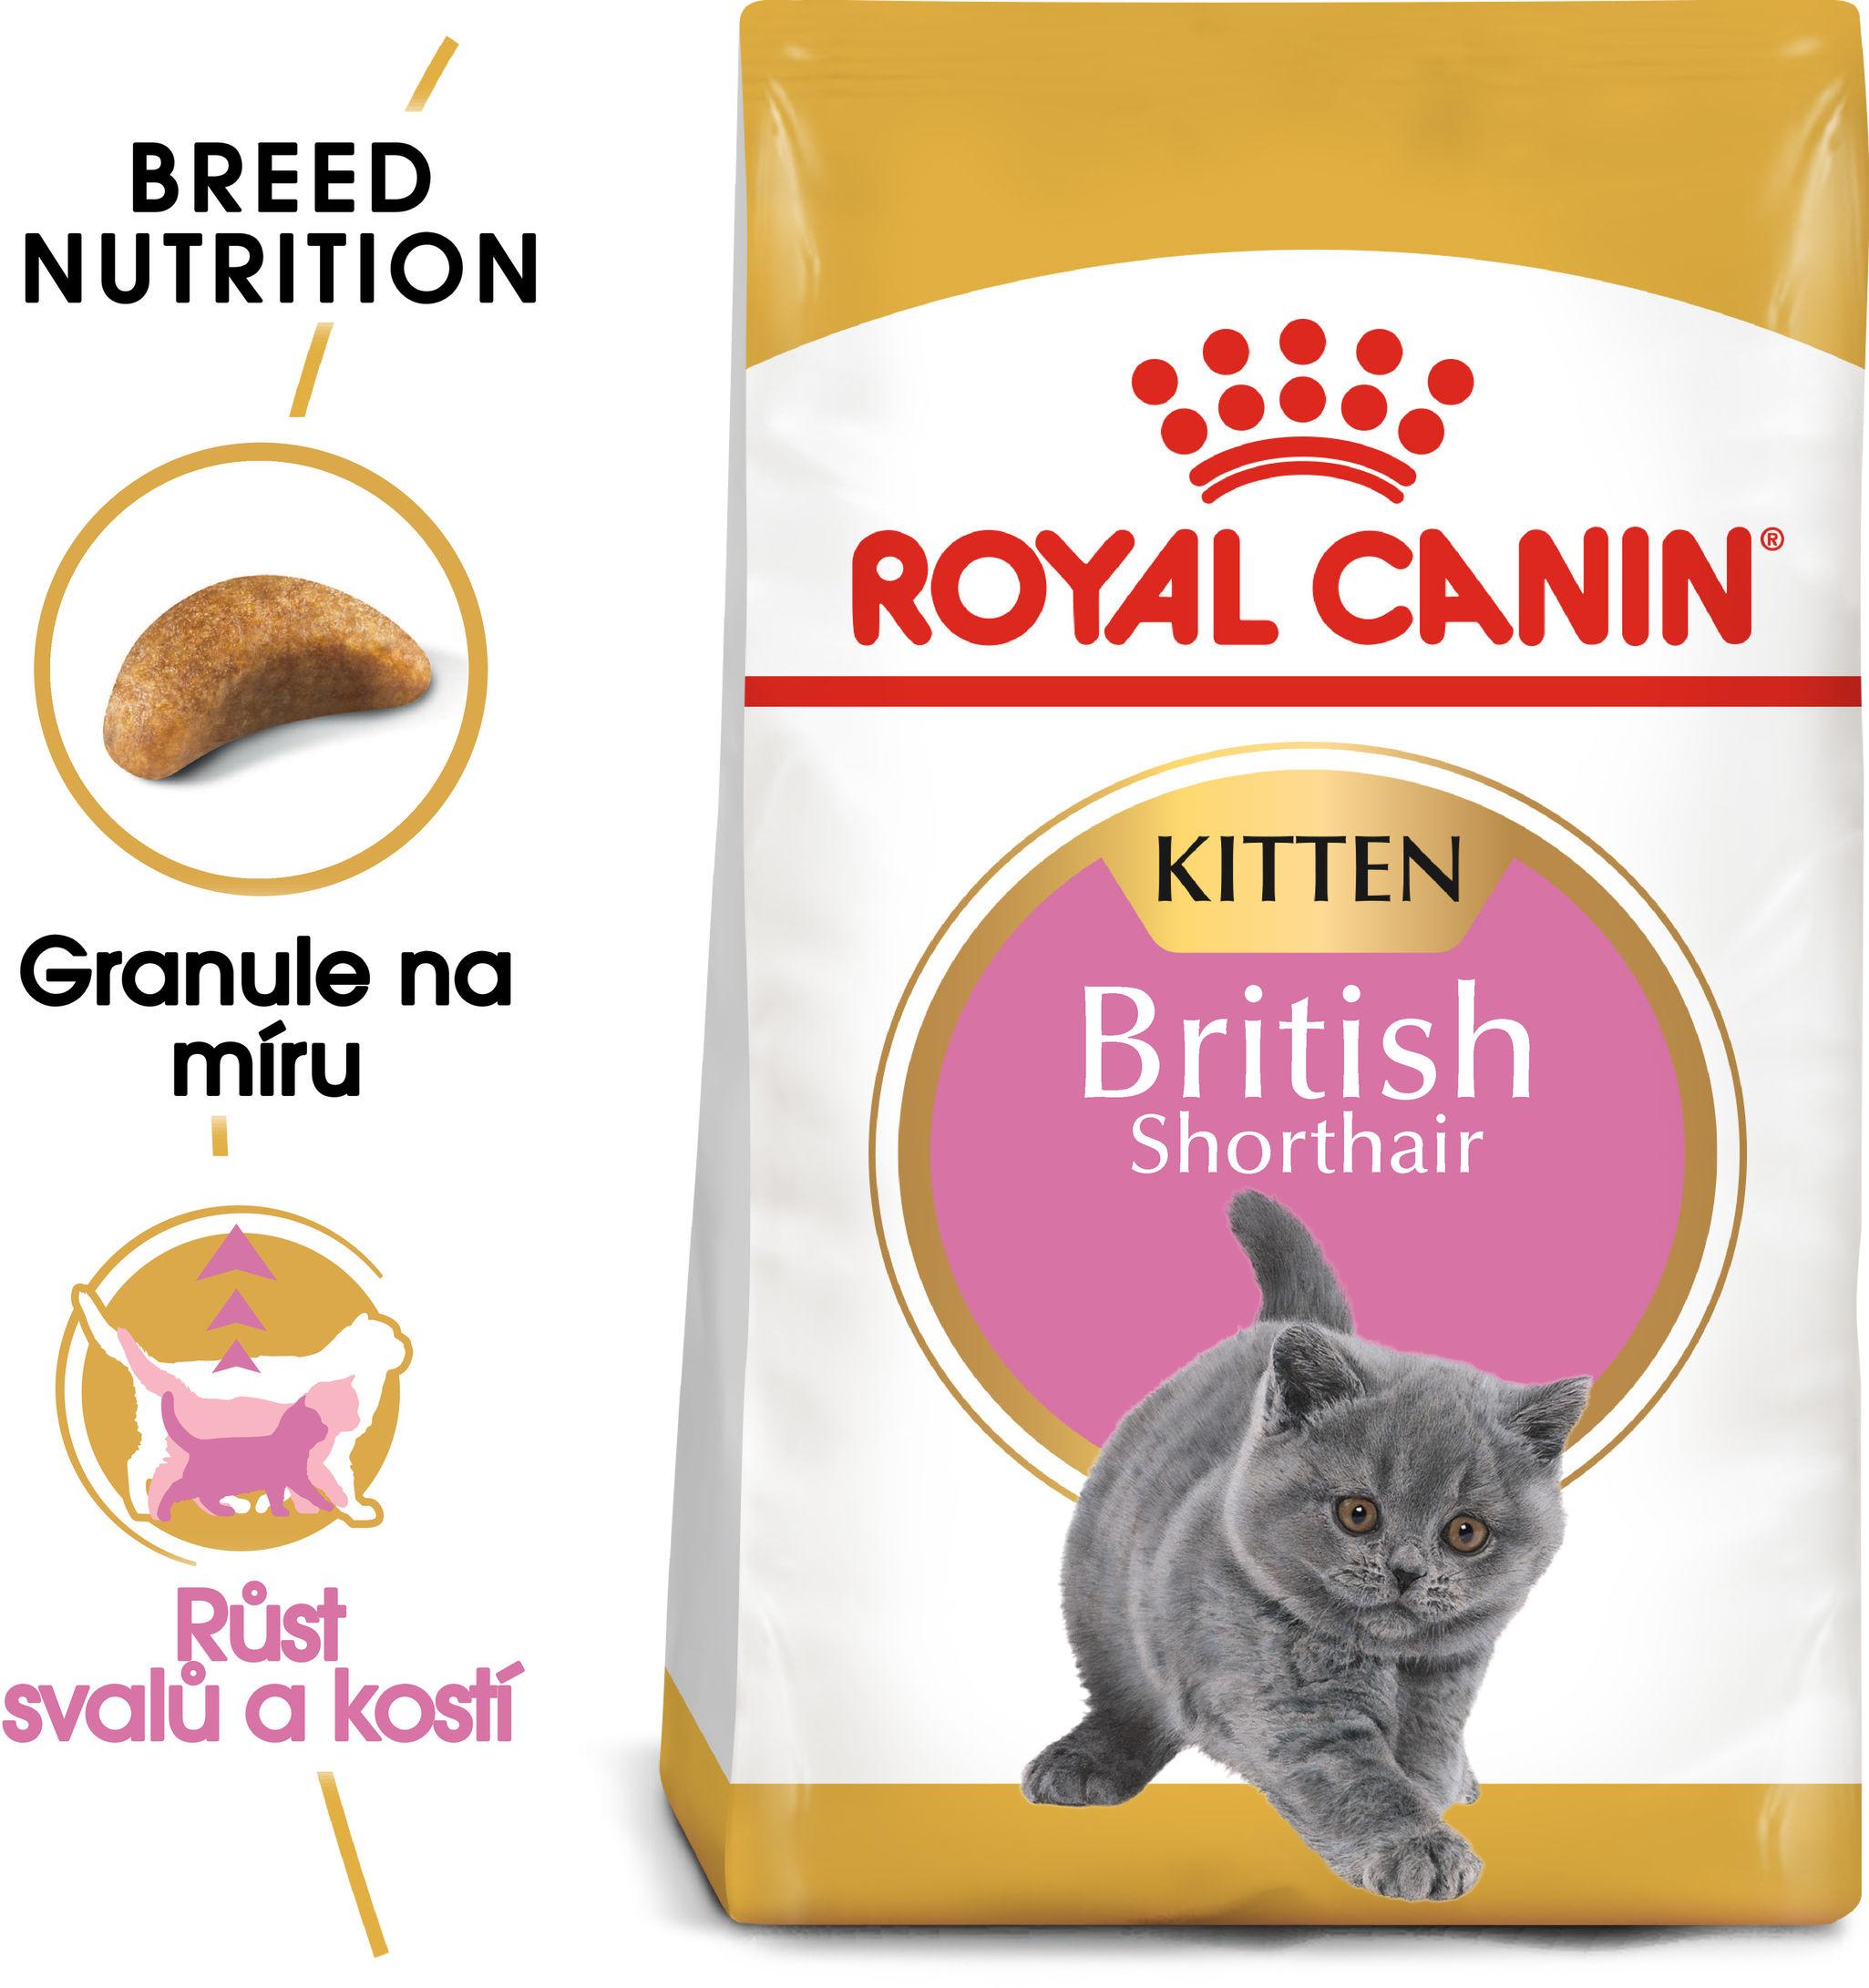 RC cat KITTEN BRITISH shorthair